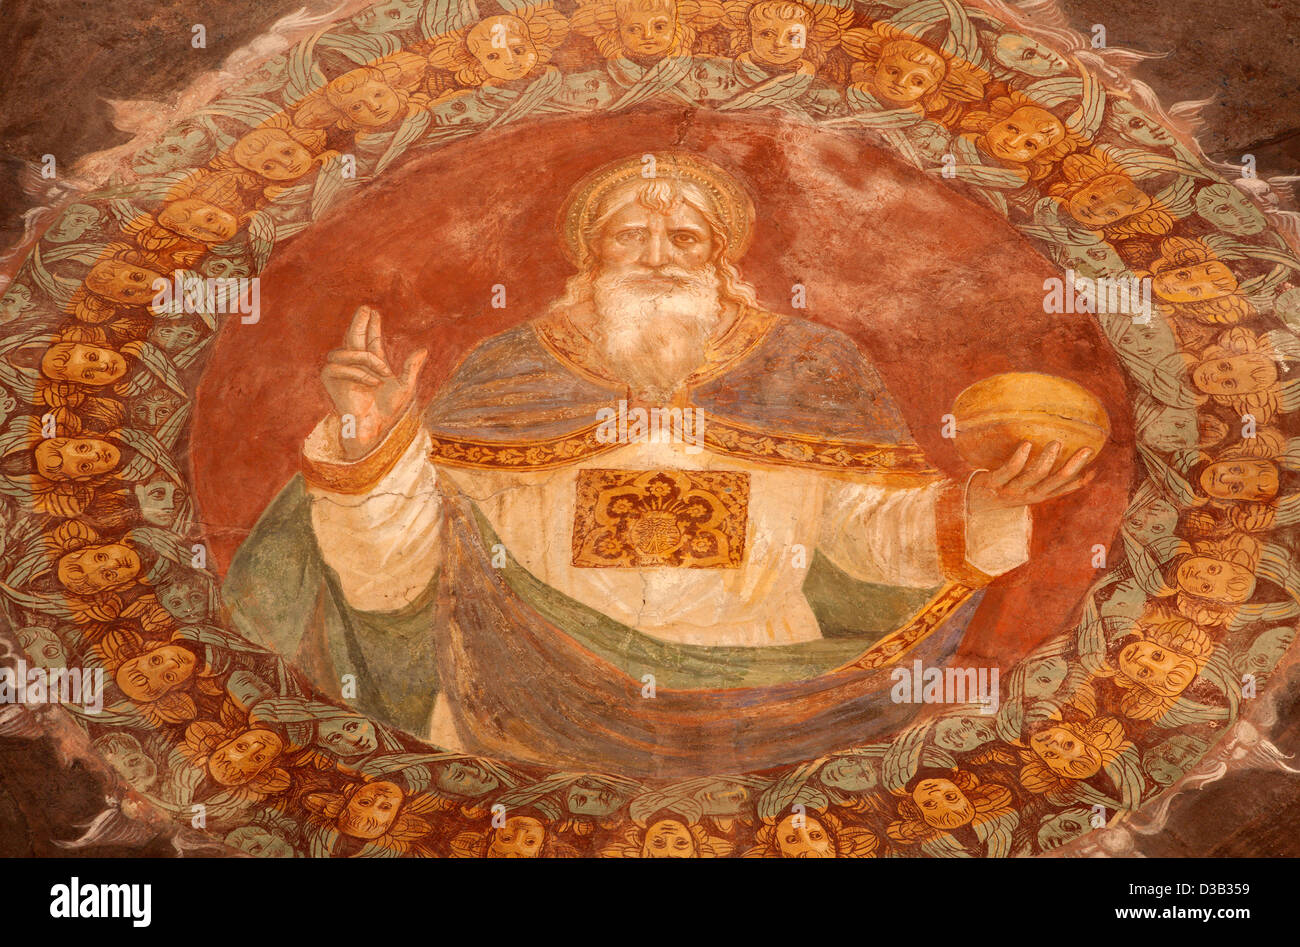 BERGAMO - JANUARY 26: God the Creator fresco form church Michele al pozzo bianco. Fresco in the apse. - Stock Image